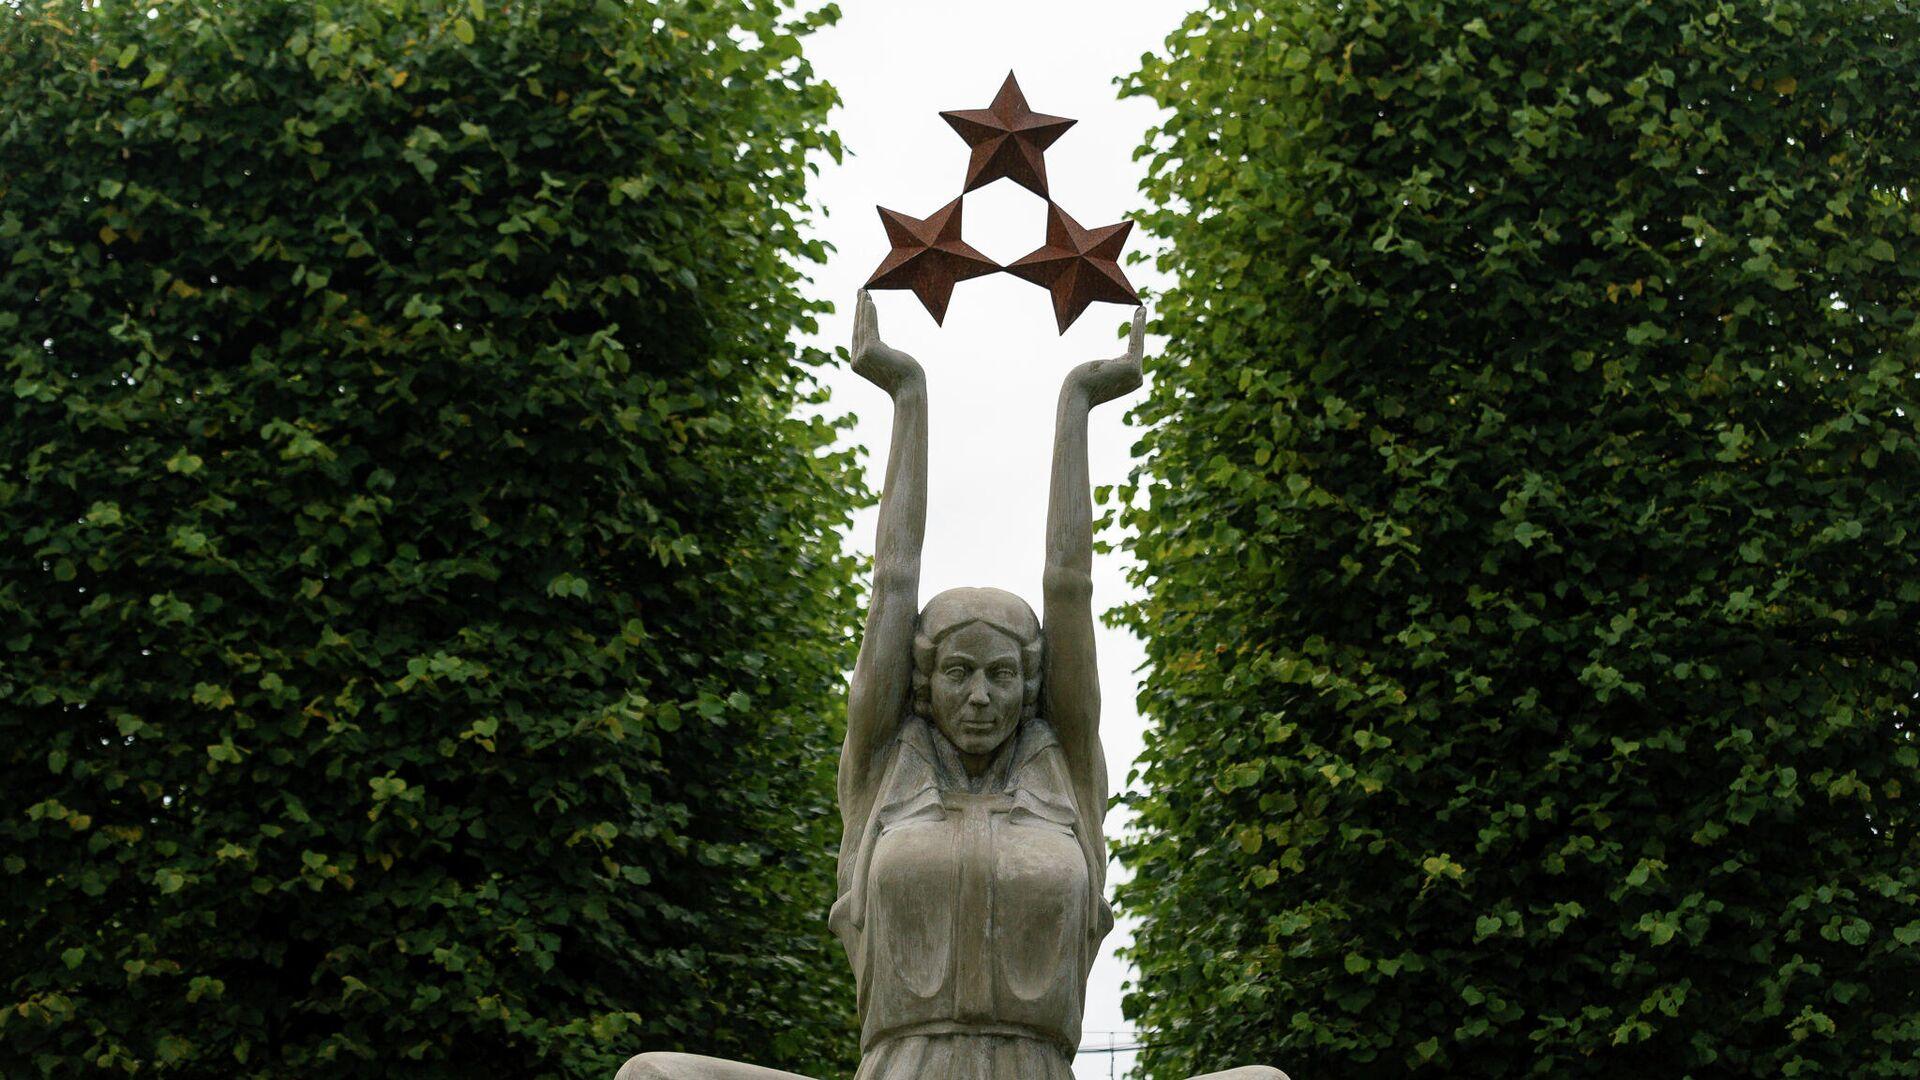 Инсталляция Будда-Свобода - Sputnik Латвия, 1920, 26.09.2021